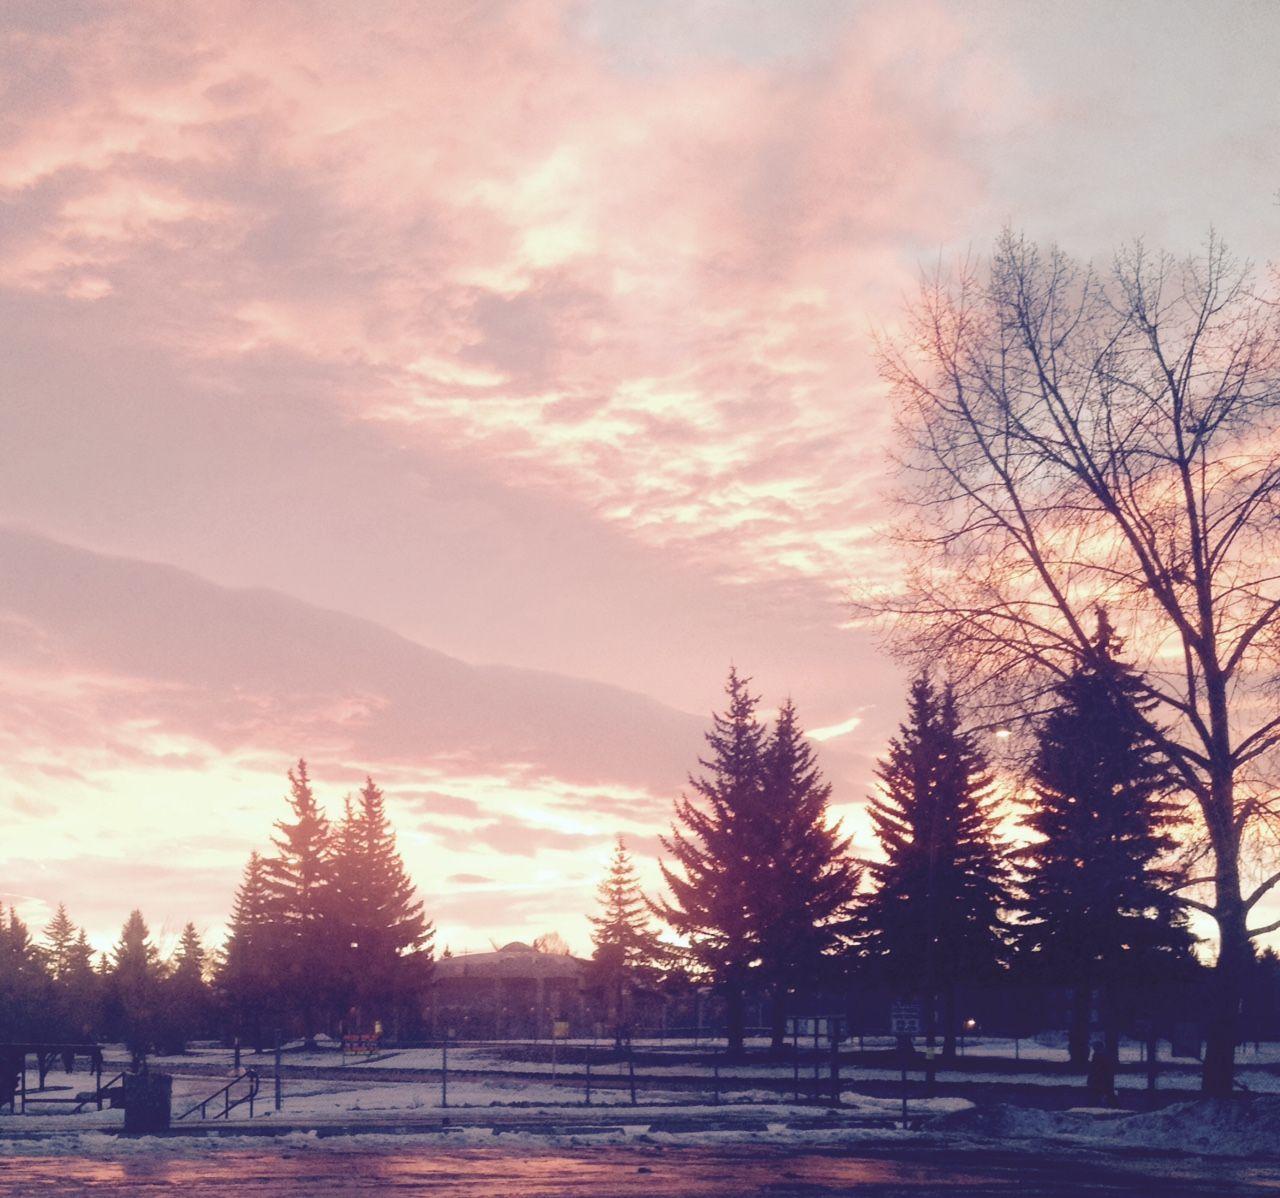 sunrise taken from the student parking lot Sunrise